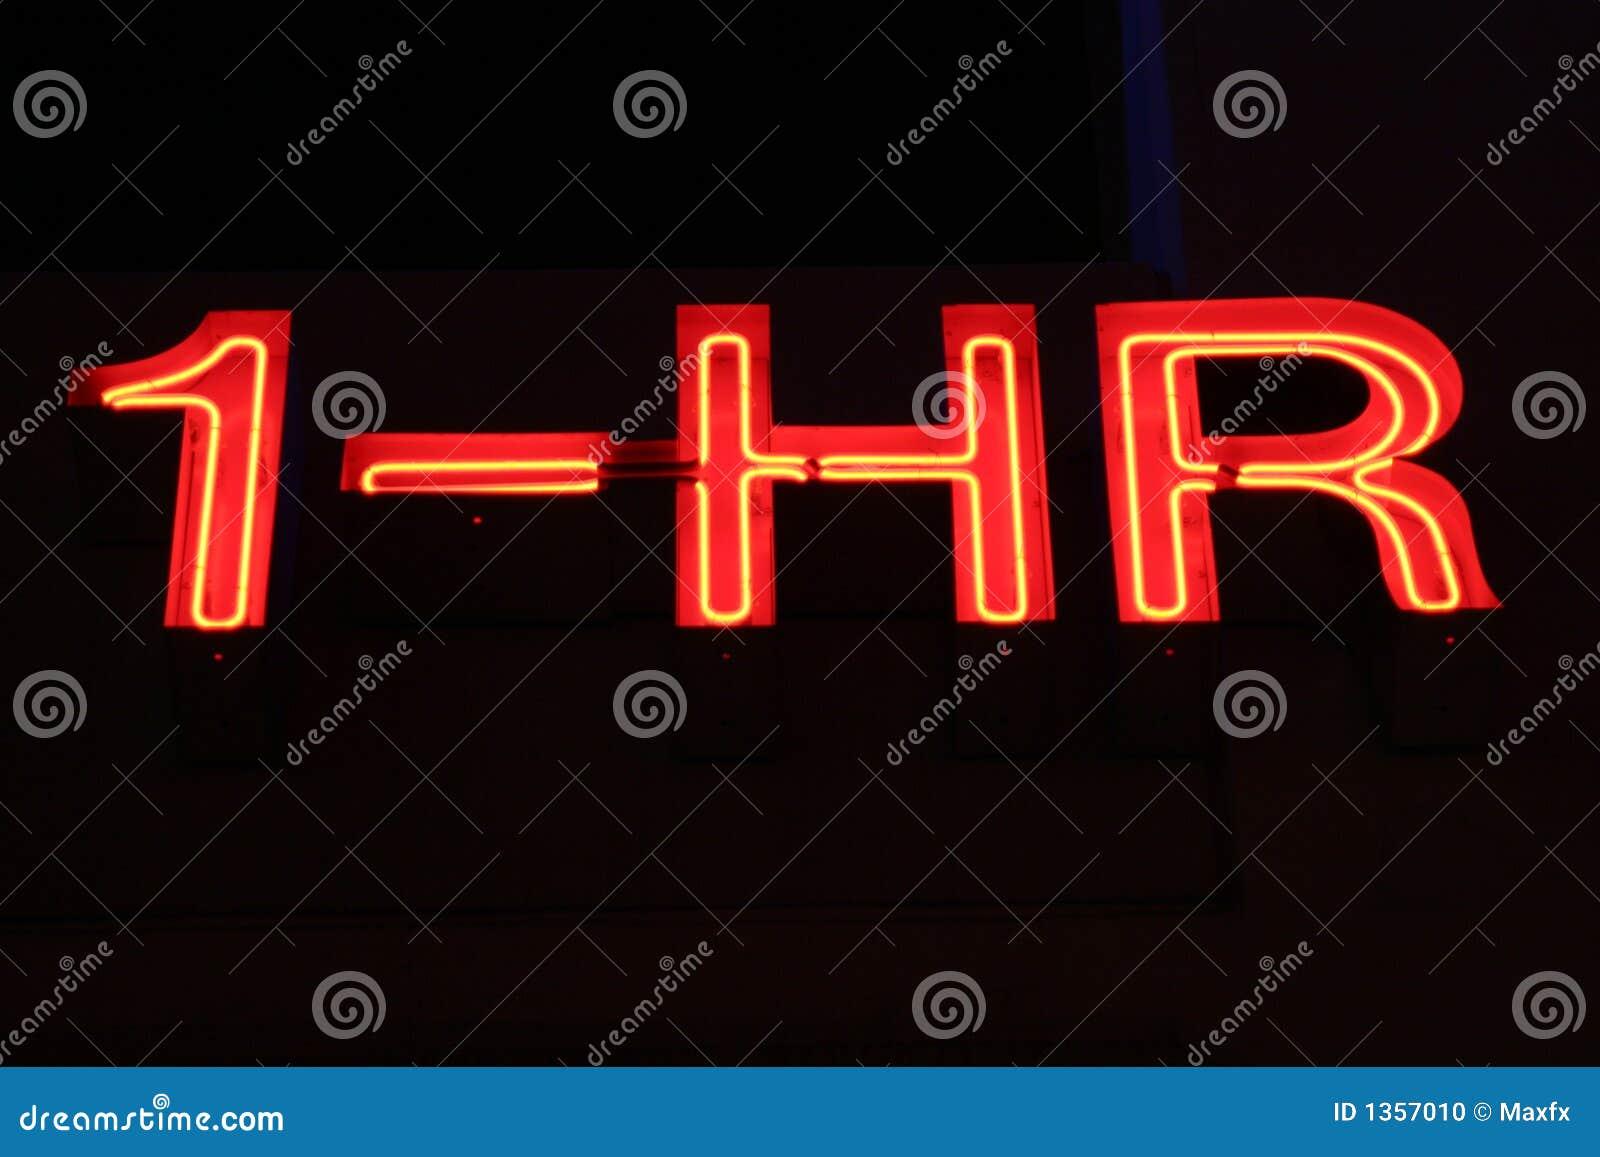 1 Hr Photo >> 1 Hour Sign Neon Lights Stock Photo Image Of Bulbs Shiny